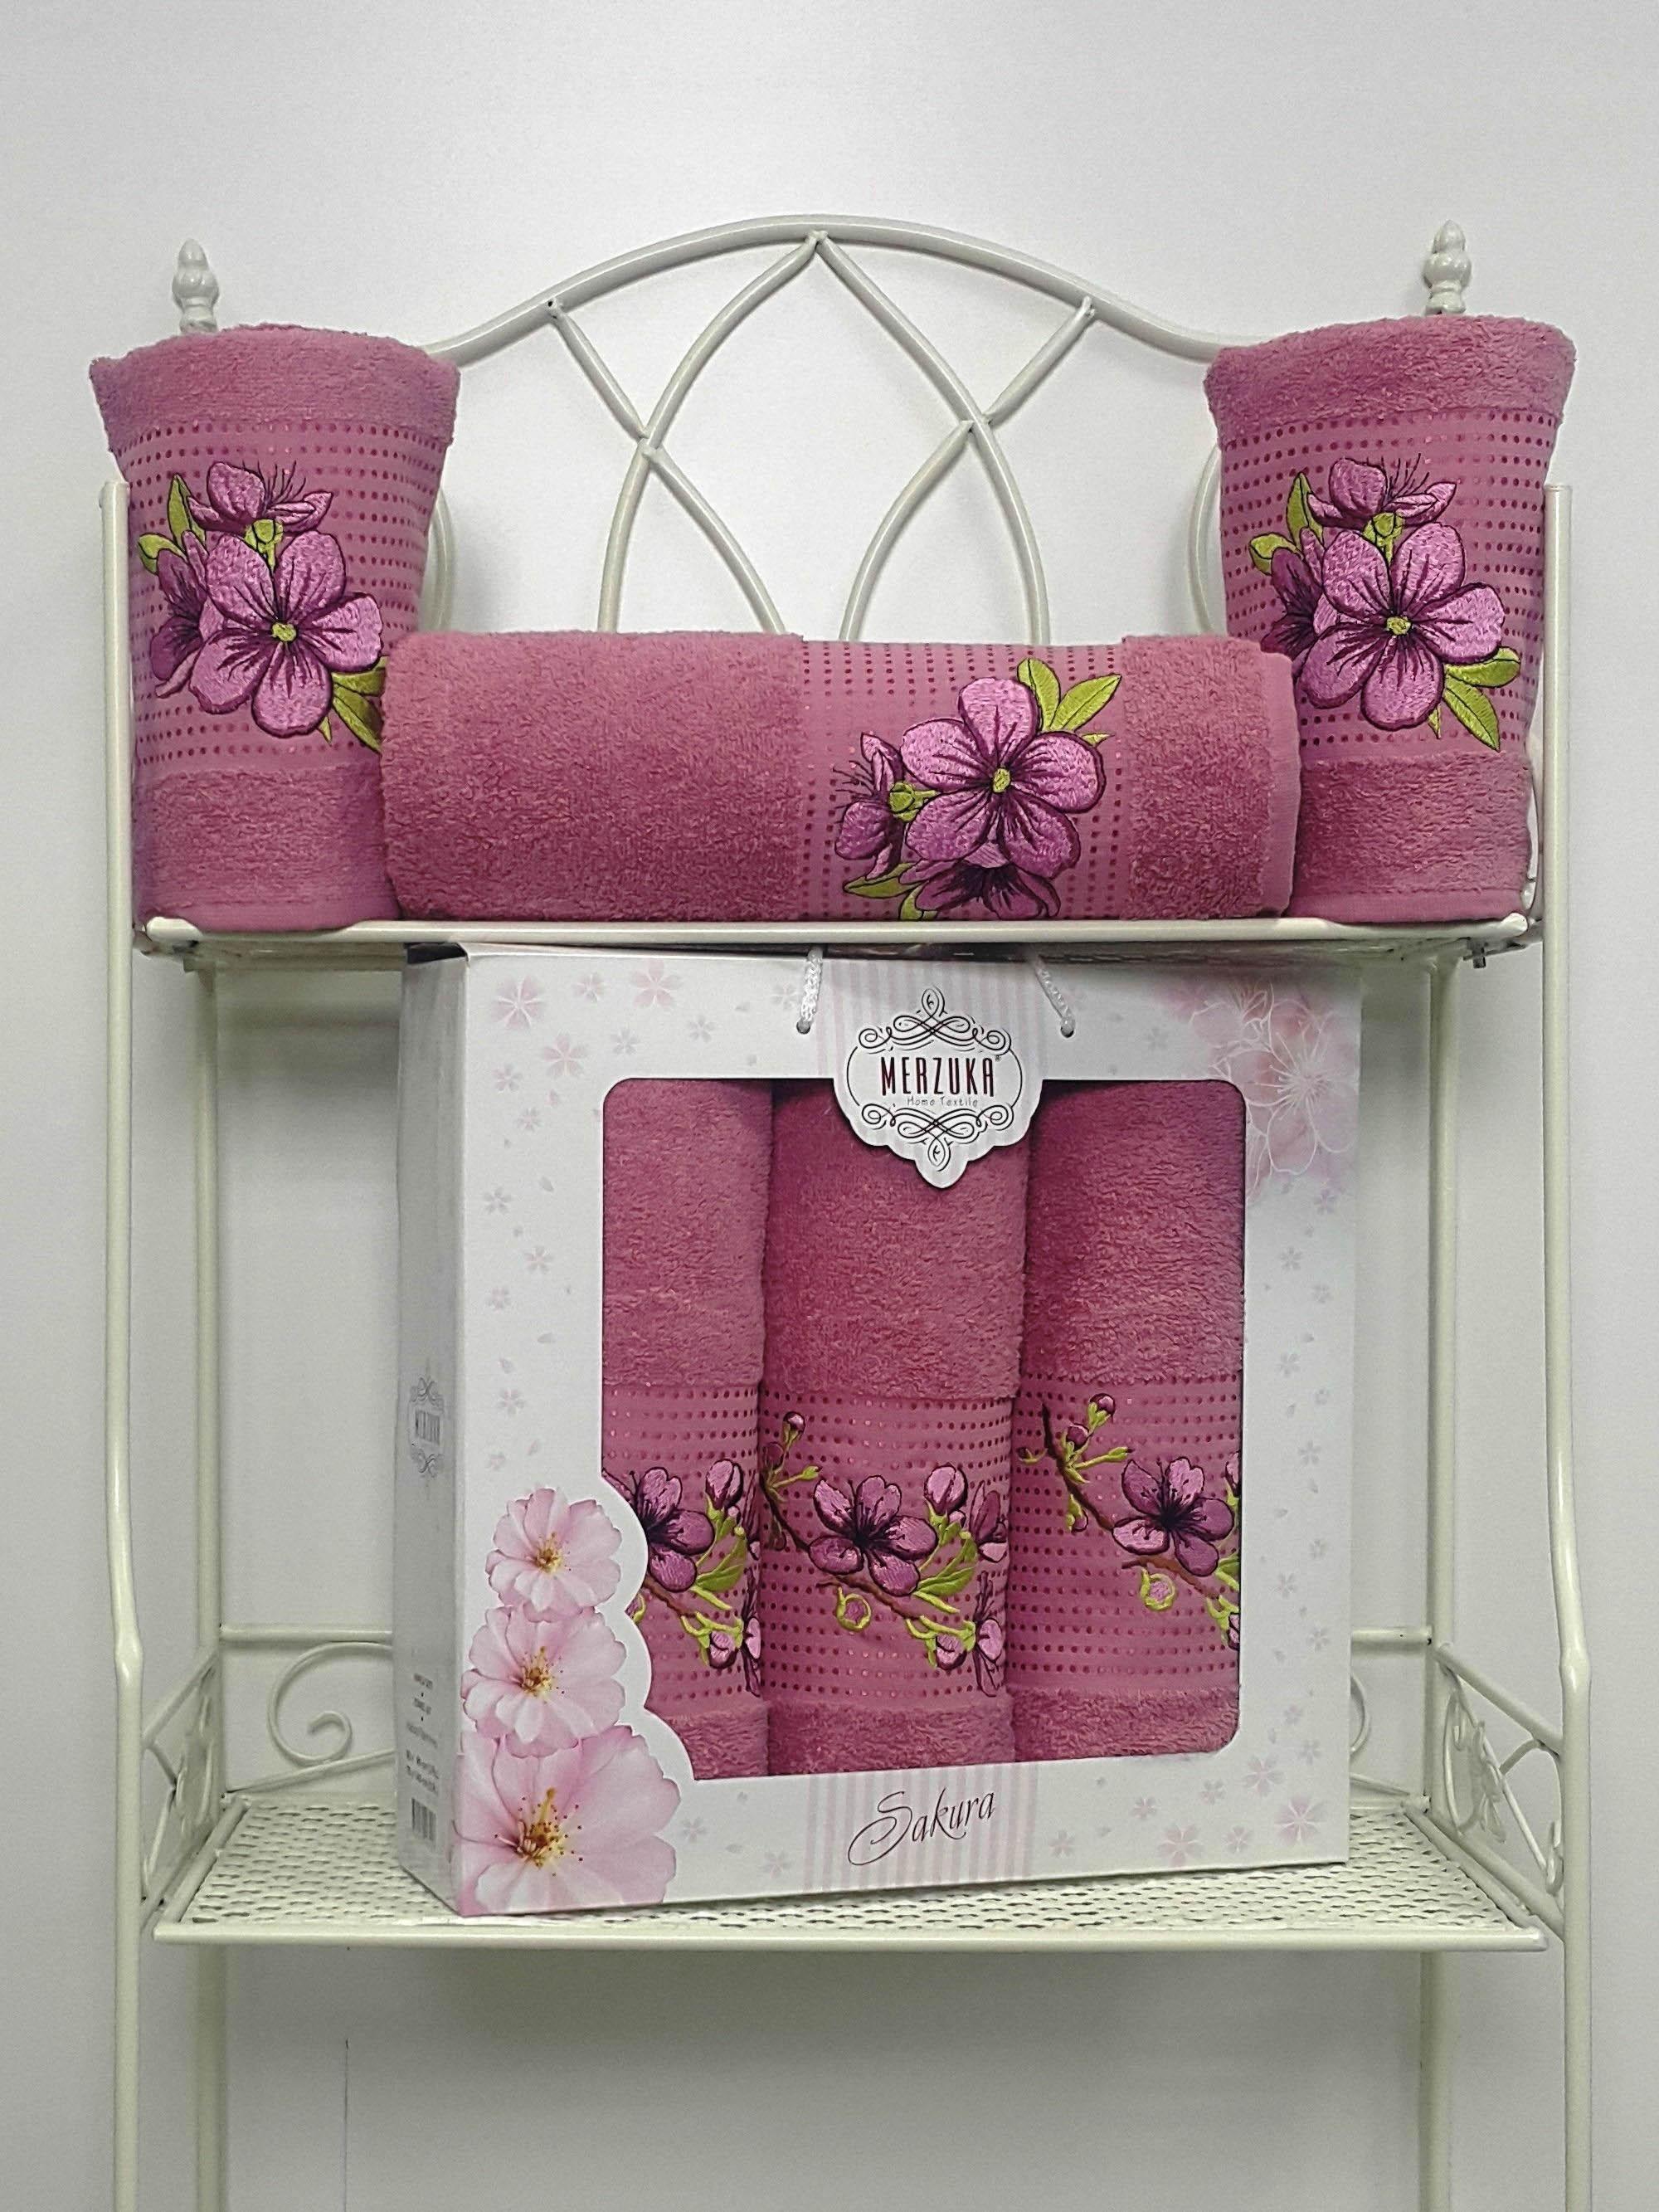 Полотенца Oran Merzuka Полотенце Sakura Цвет: Тёмно-Розовый (Набор) набор из 3 полотенец merzuka sakura 50х90 2 70х140 8432 розовый